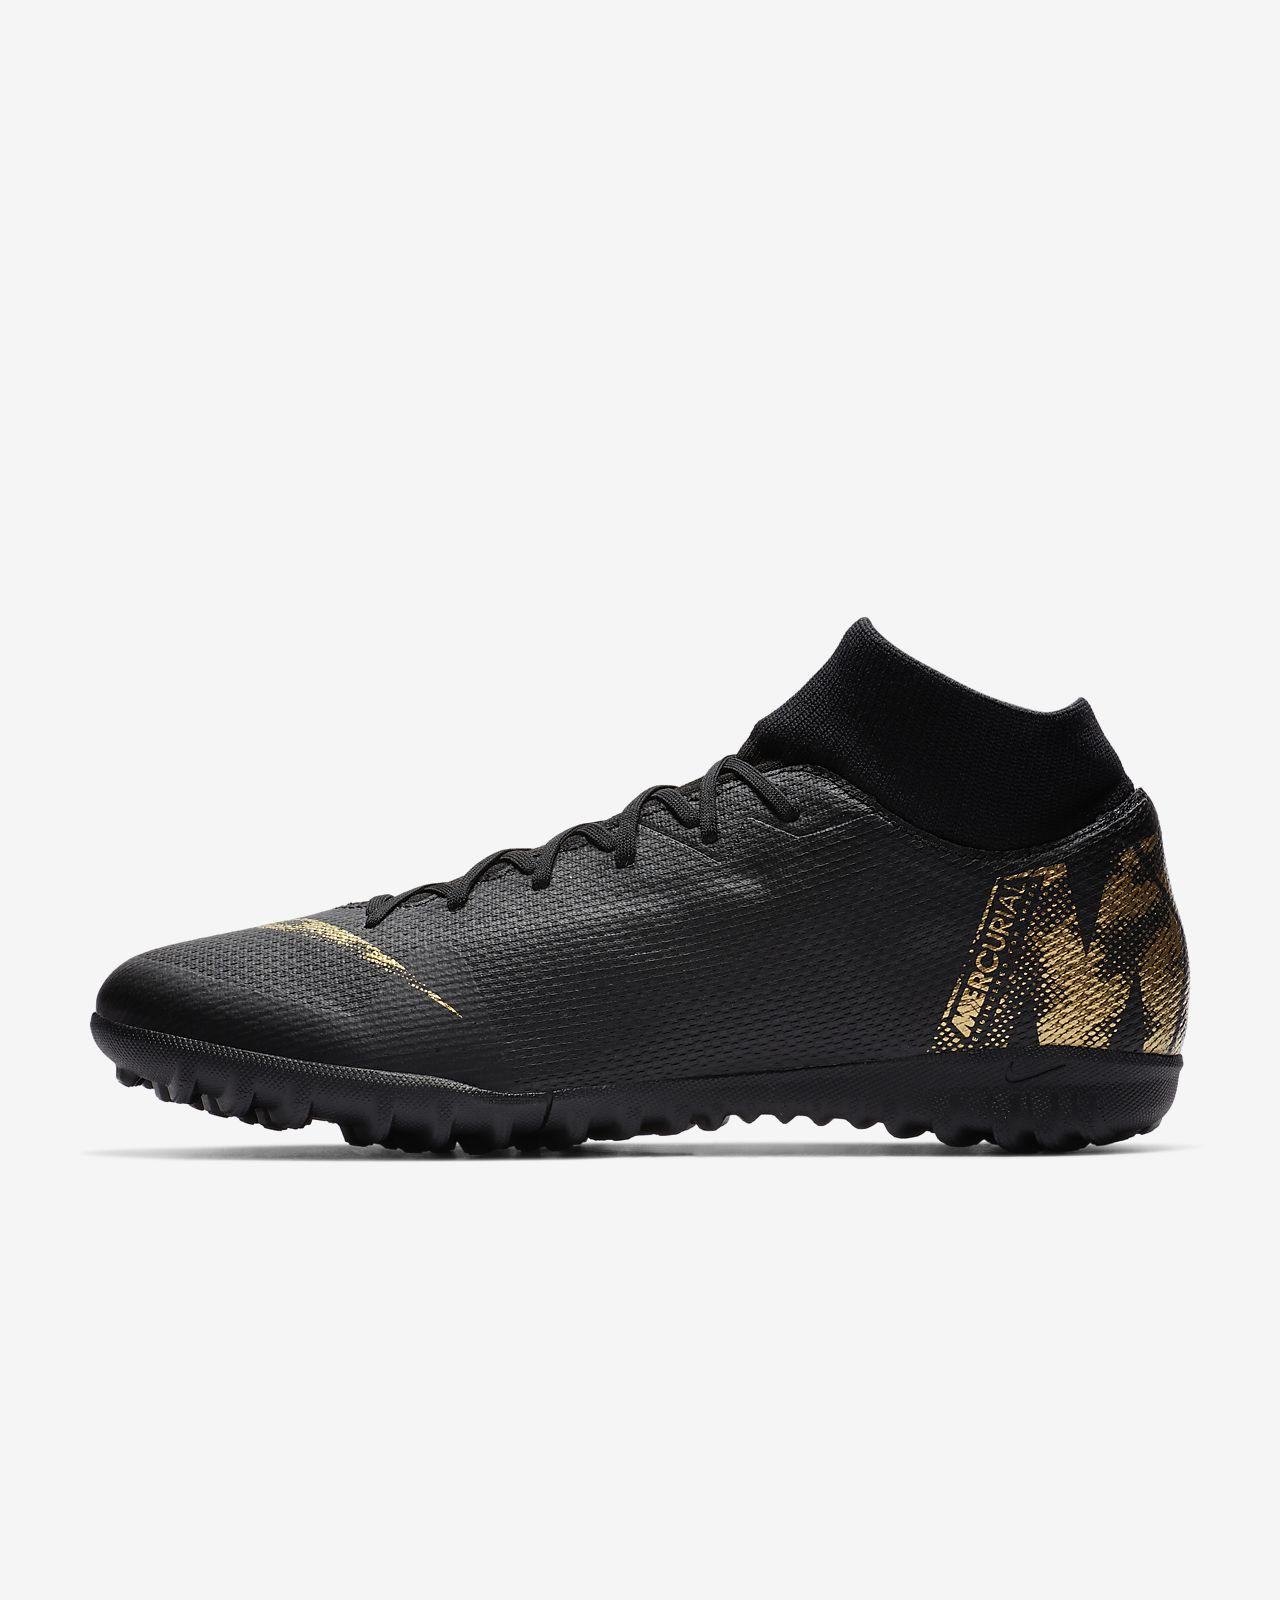 Nike SuperflyX 6 Academy TF Turf Football Boot